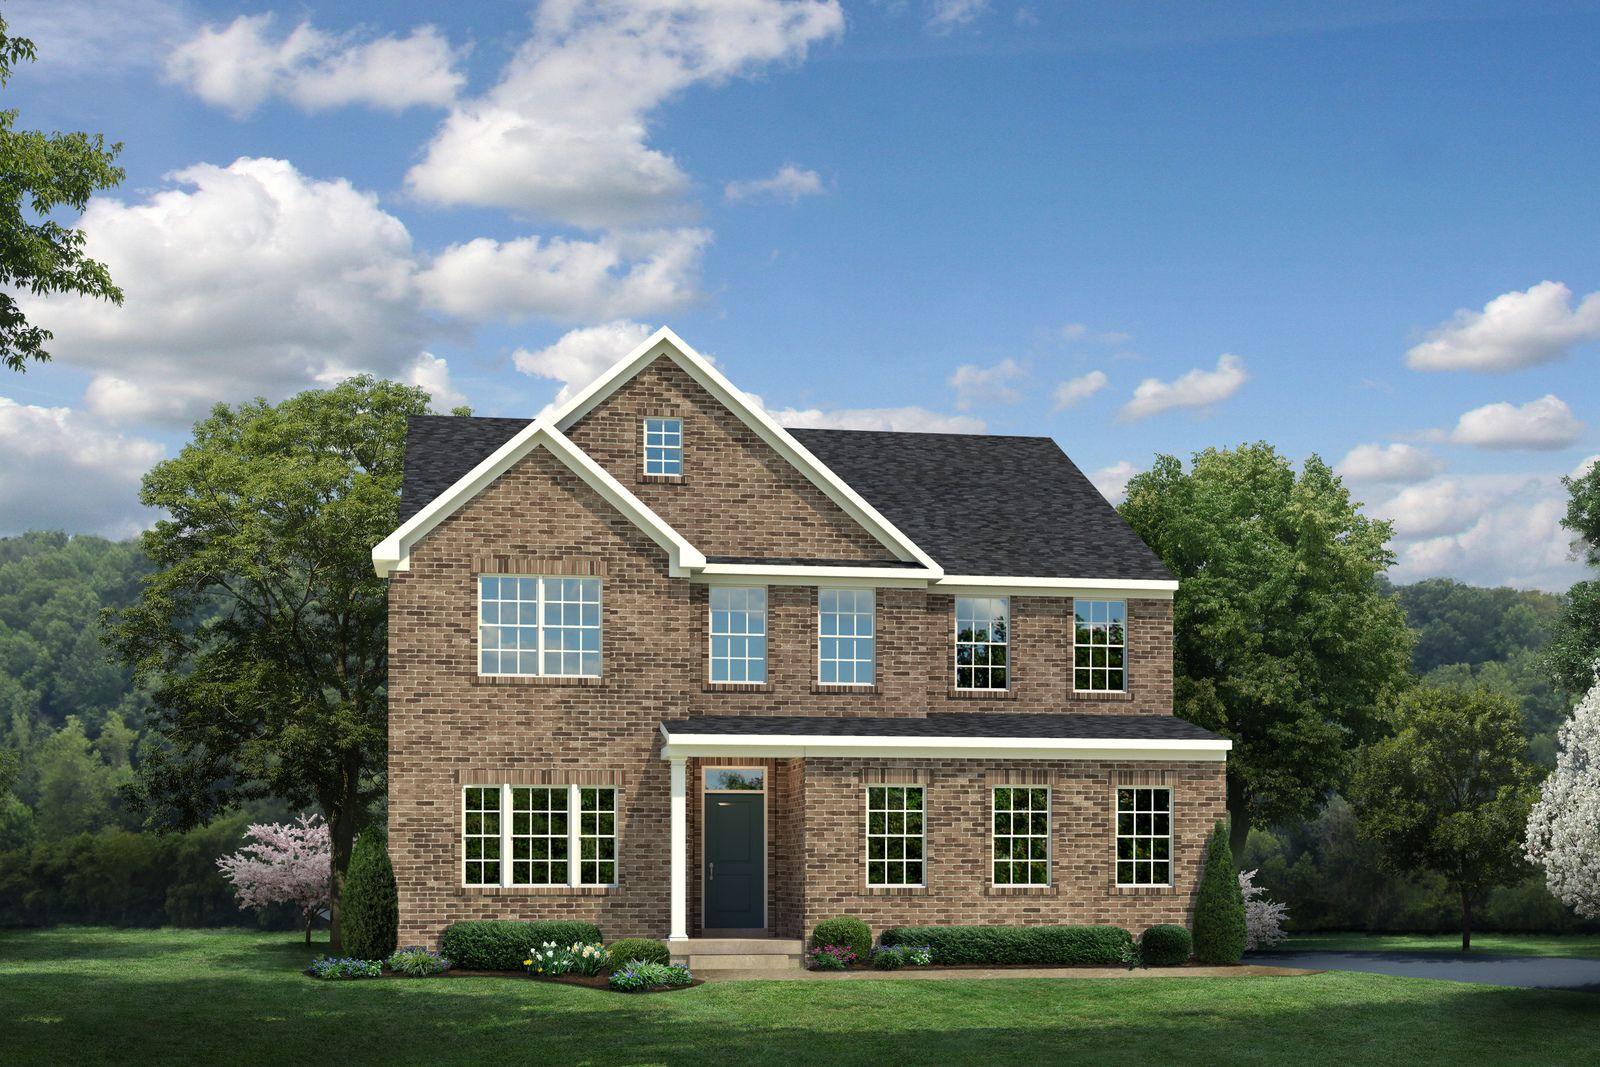 Single Family for Active at Parx Estates - York 12109 Aden Rd Nokesville, Virginia 20181 United States